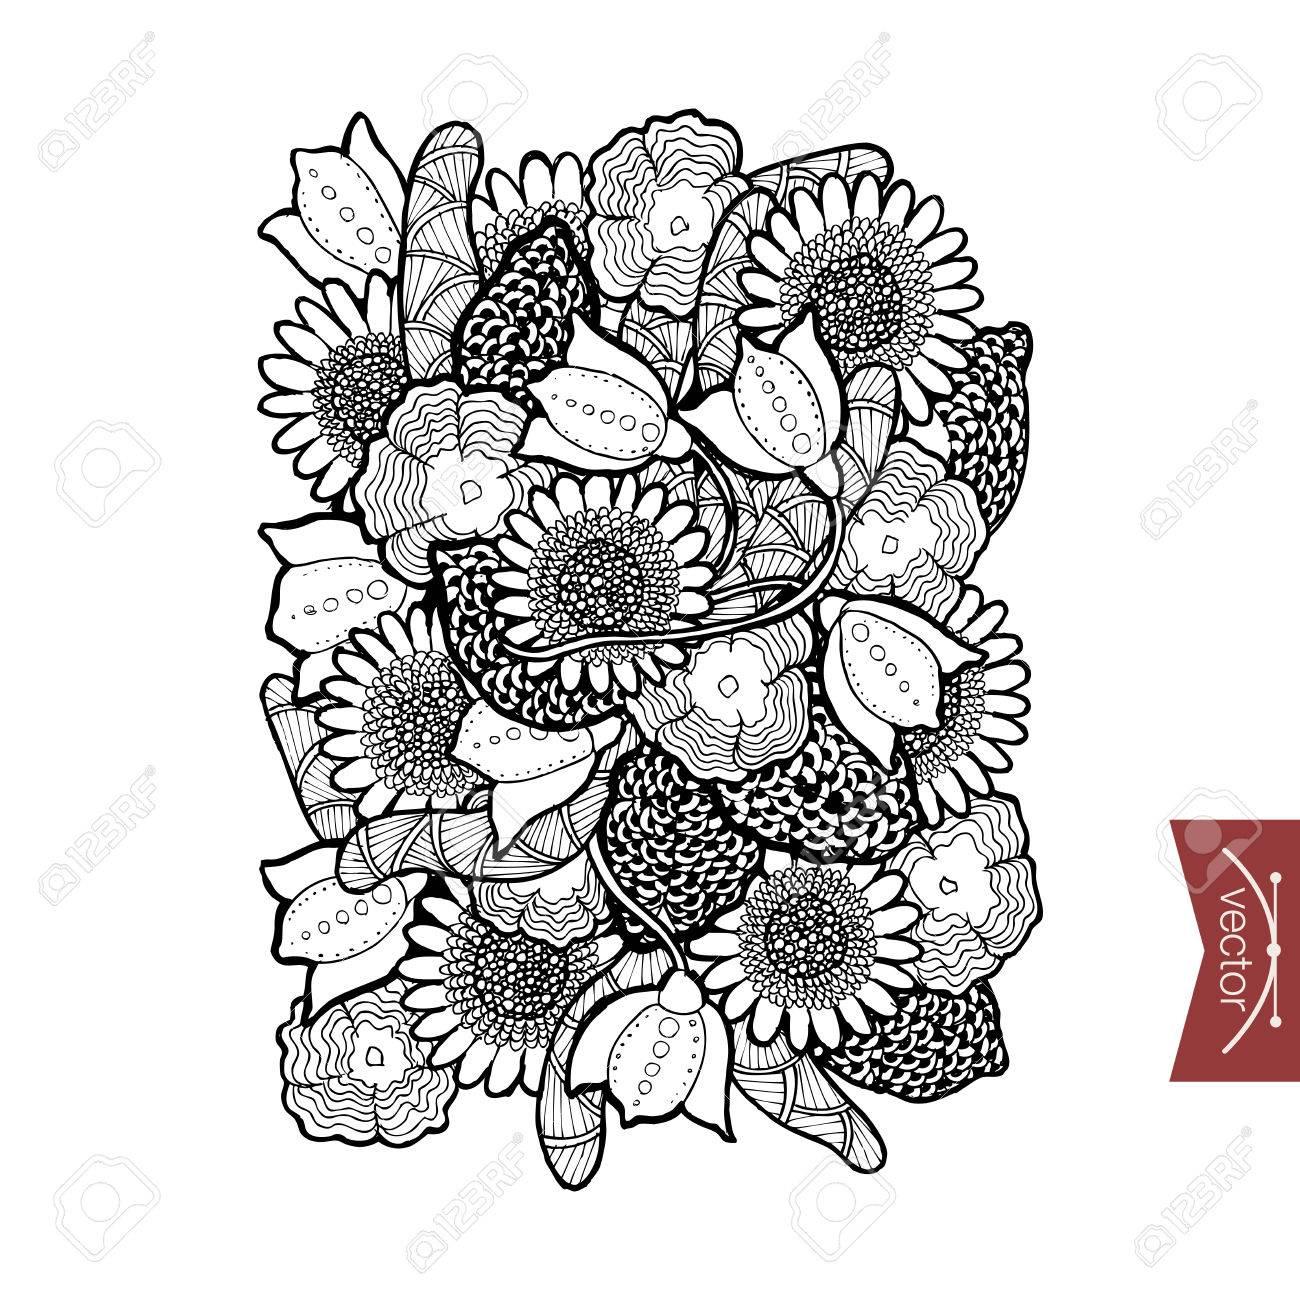 Engraving vintage hand drawn floral elements doodle collage pencil sketch floristic shop illustration stock